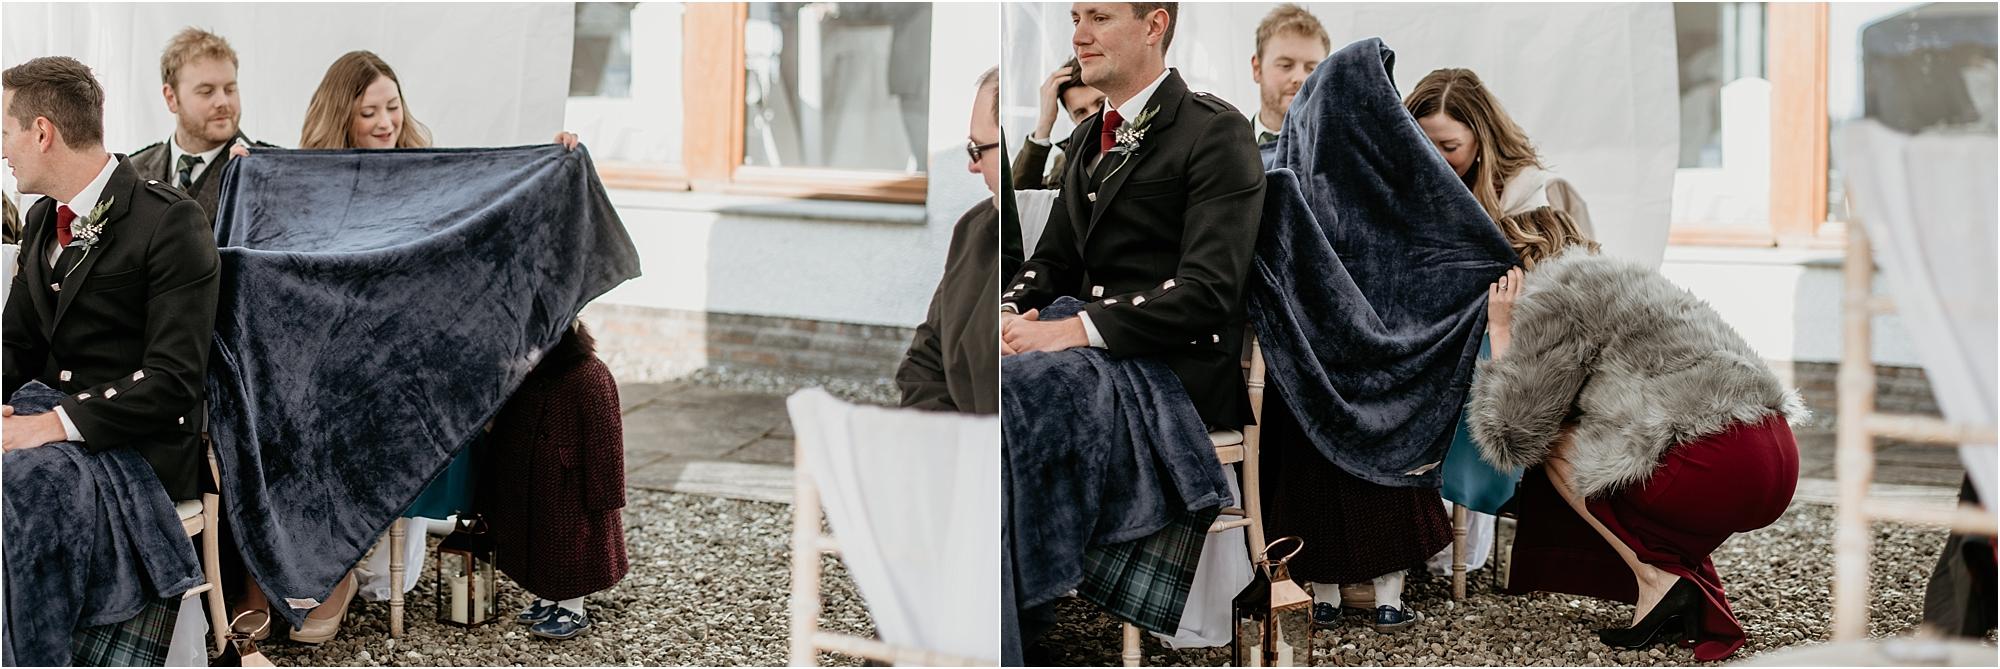 Kinlochard-village-hall-scottish-wedding-claire-fleck-photography__0020.jpg